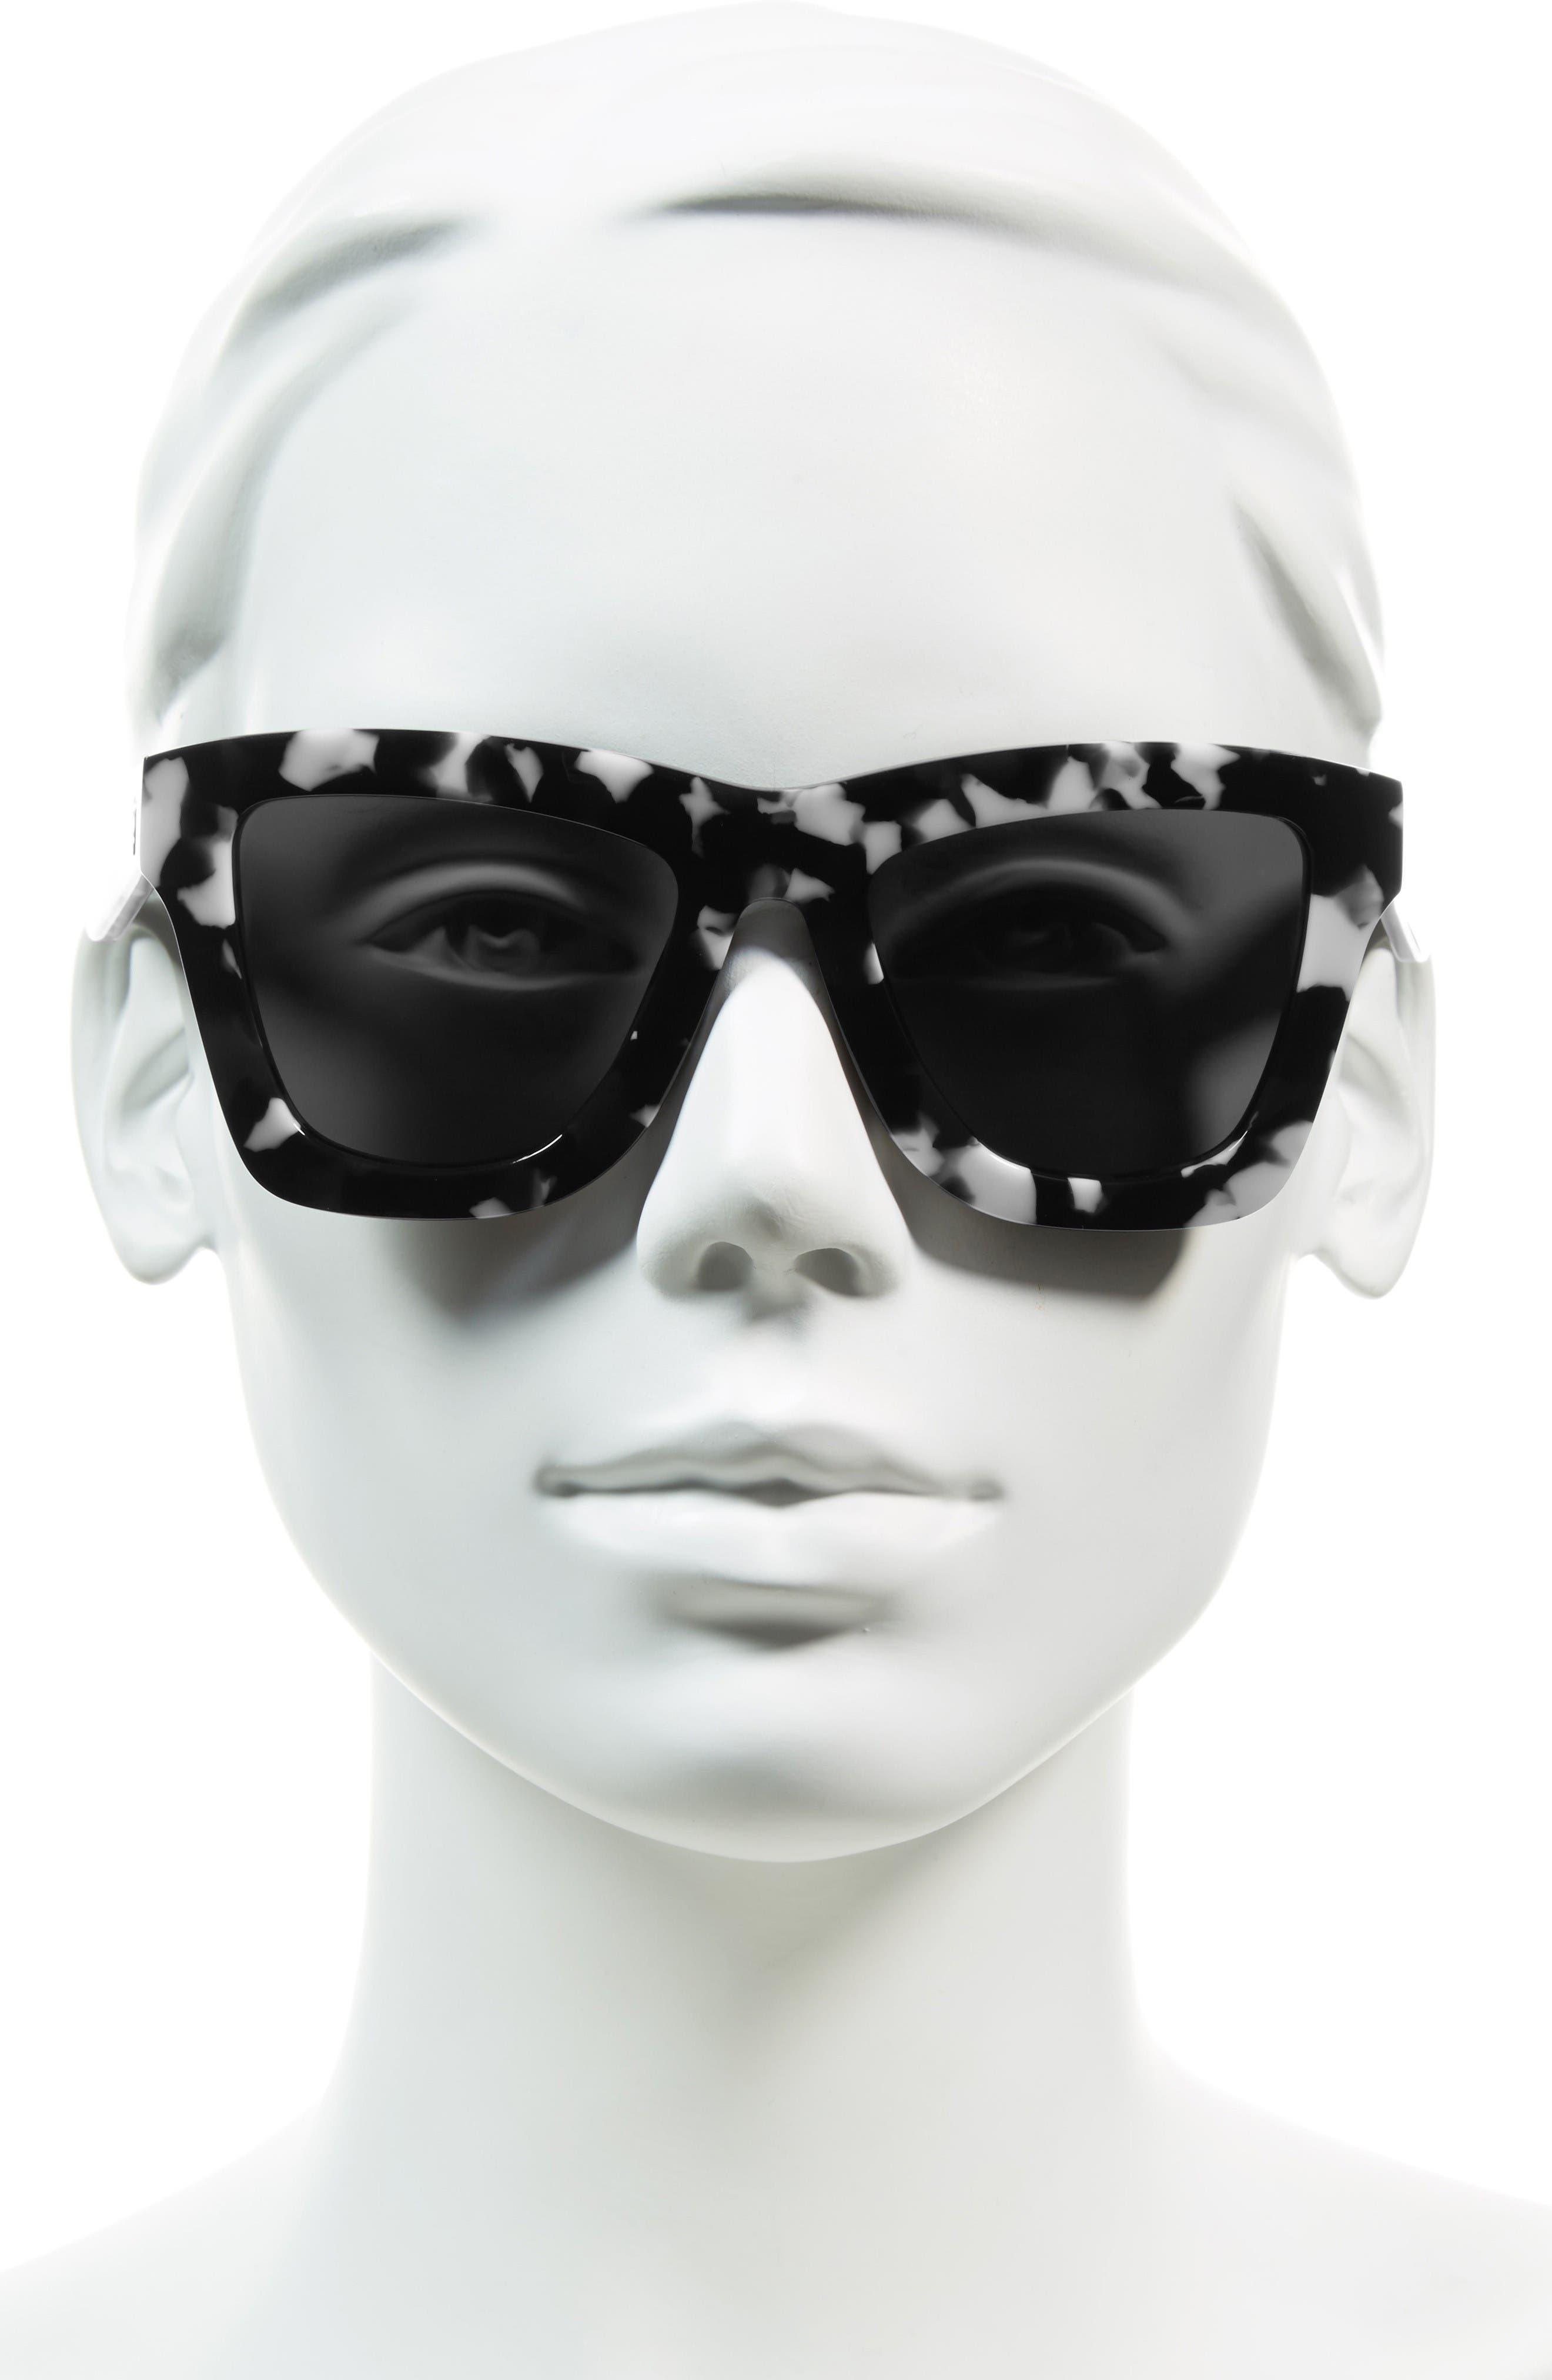 DB II 50mm Retro Sunglasses,                             Alternate thumbnail 2, color,                             Black Marble/ Black